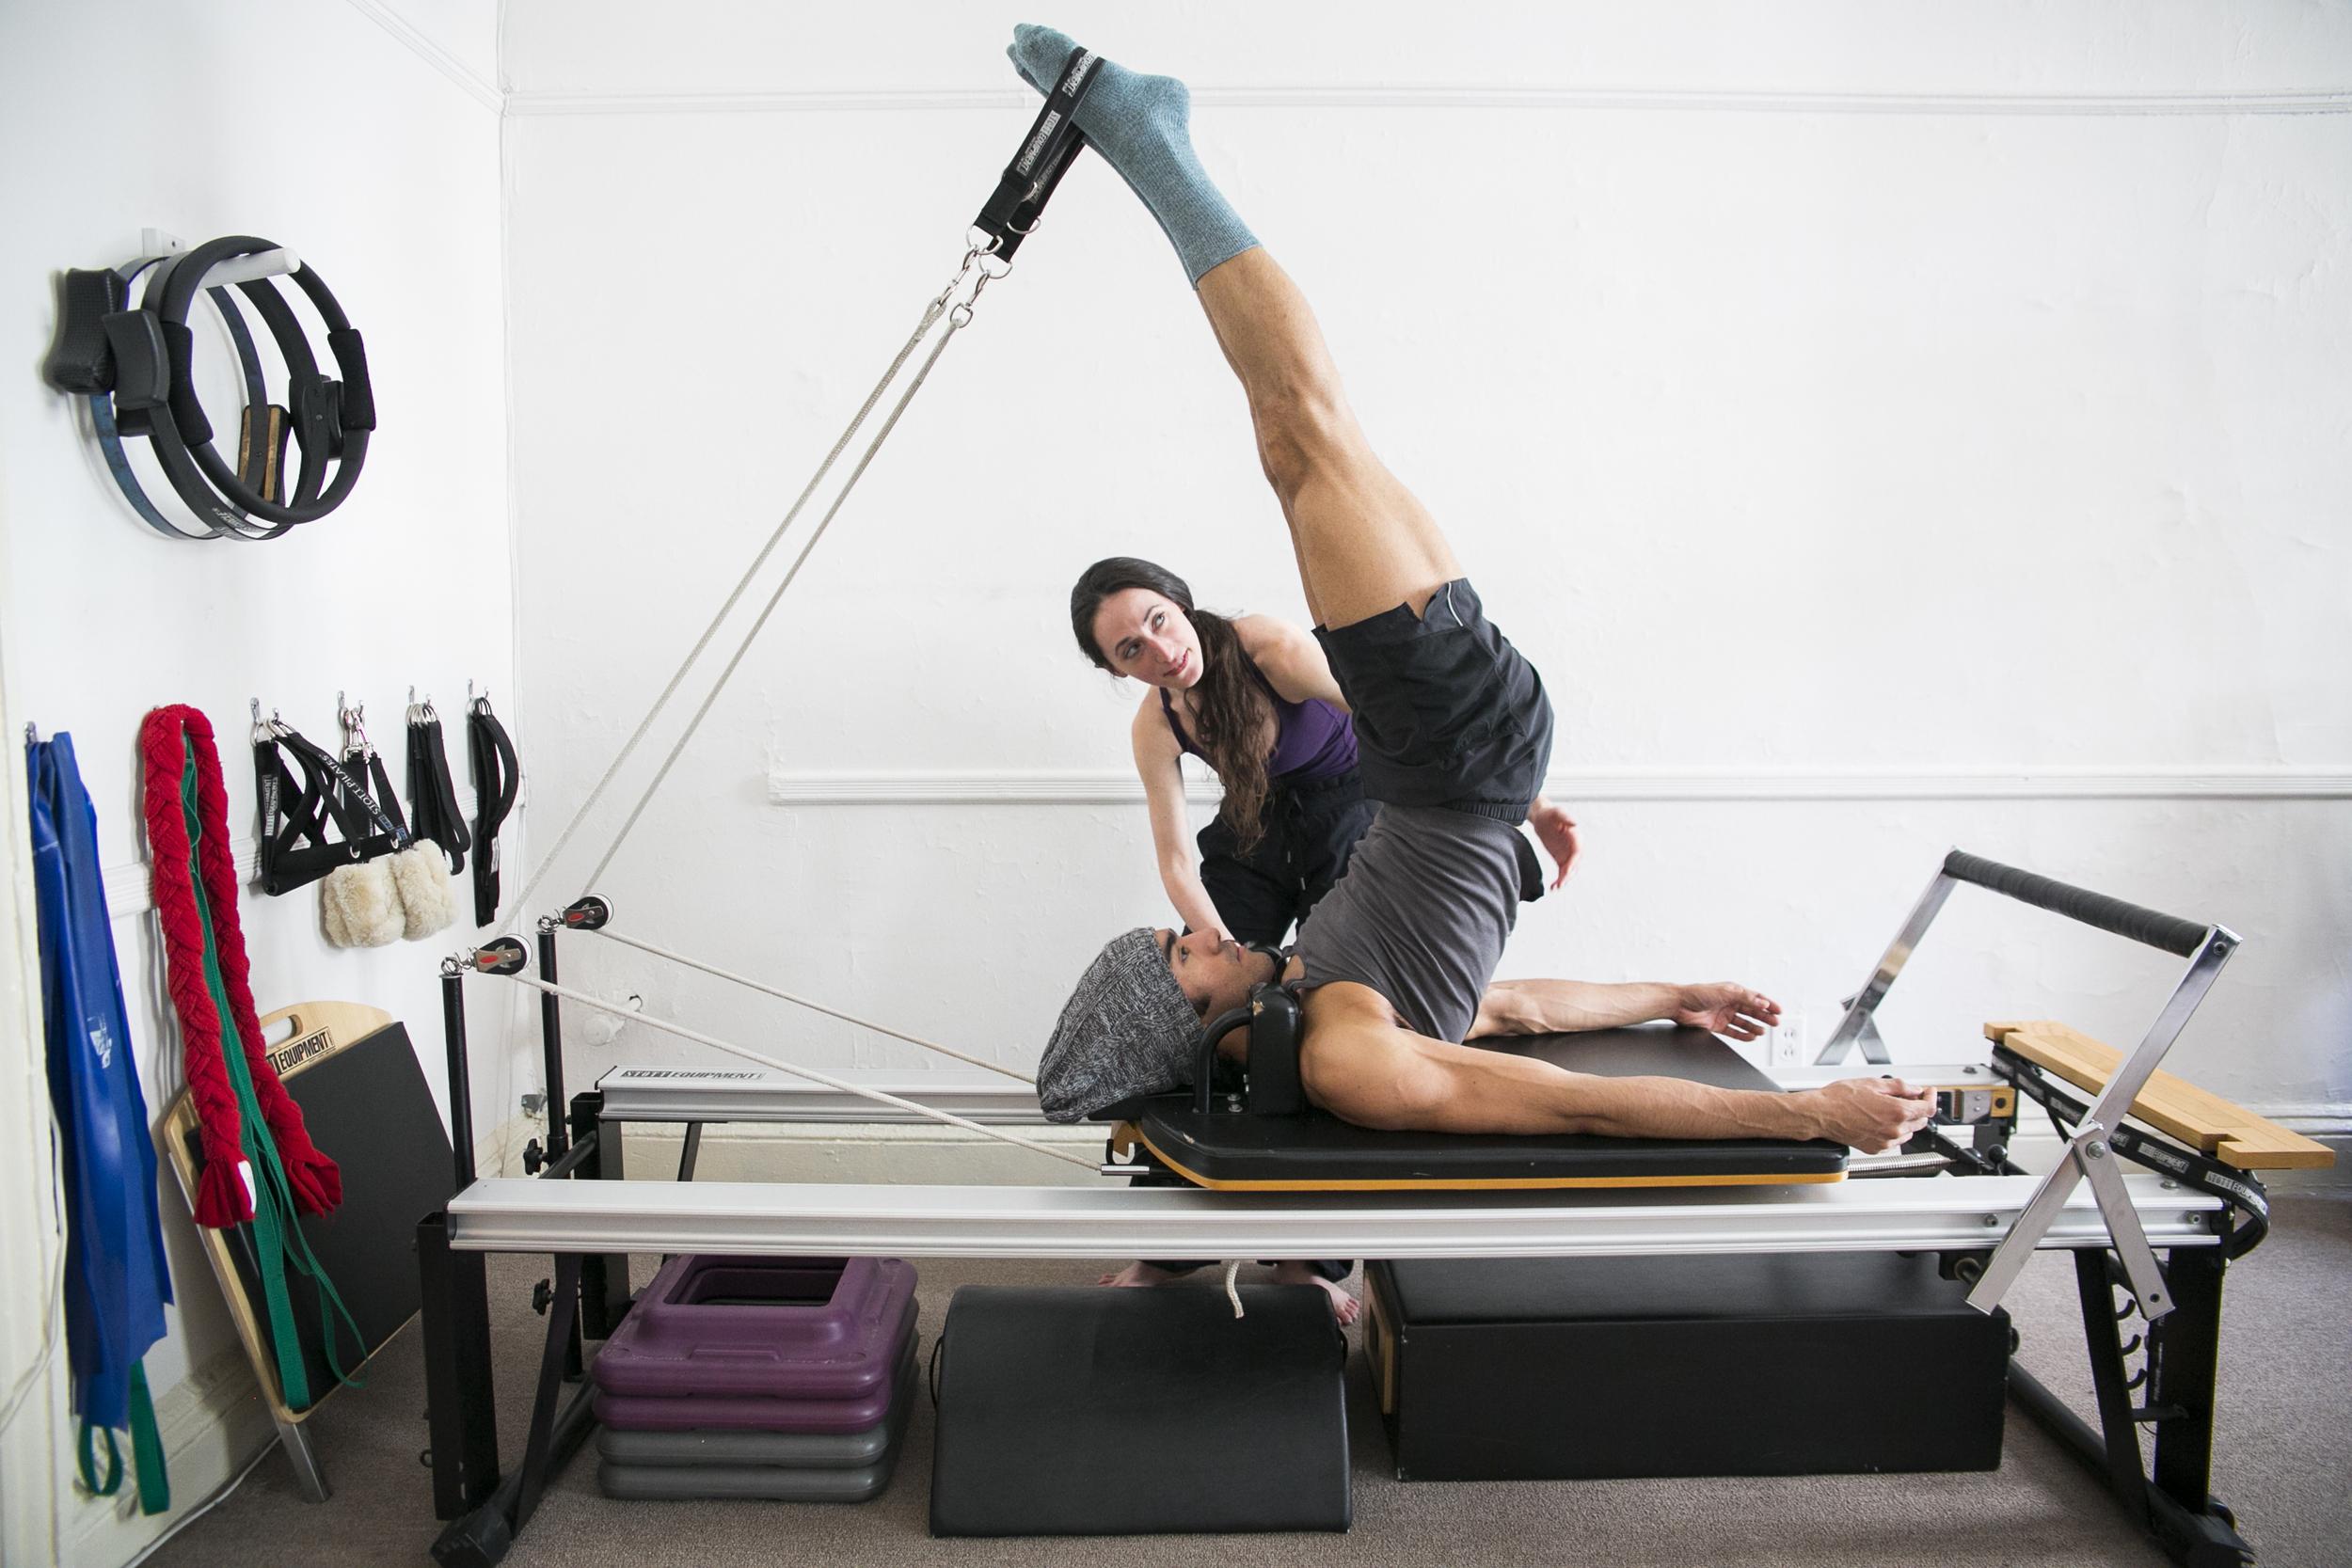 150325_DanielleRusso_Pilates_WhitneyBrowne-15.jpg